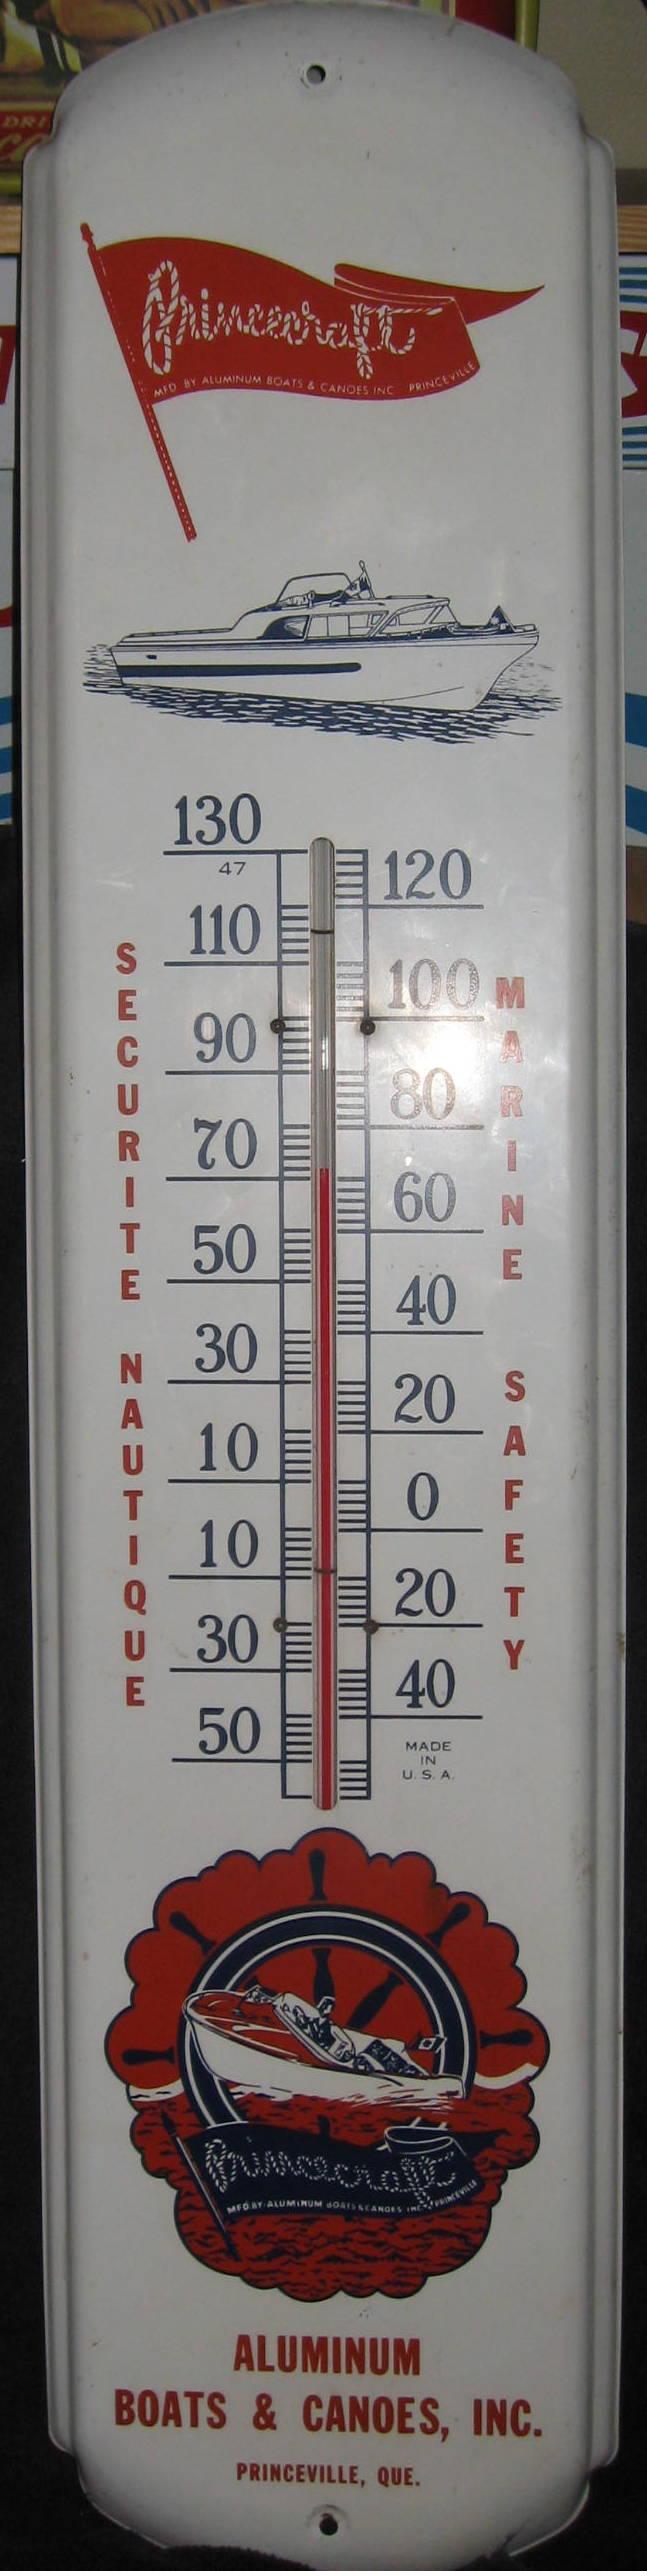 thermometre  princcraft  Img_3520